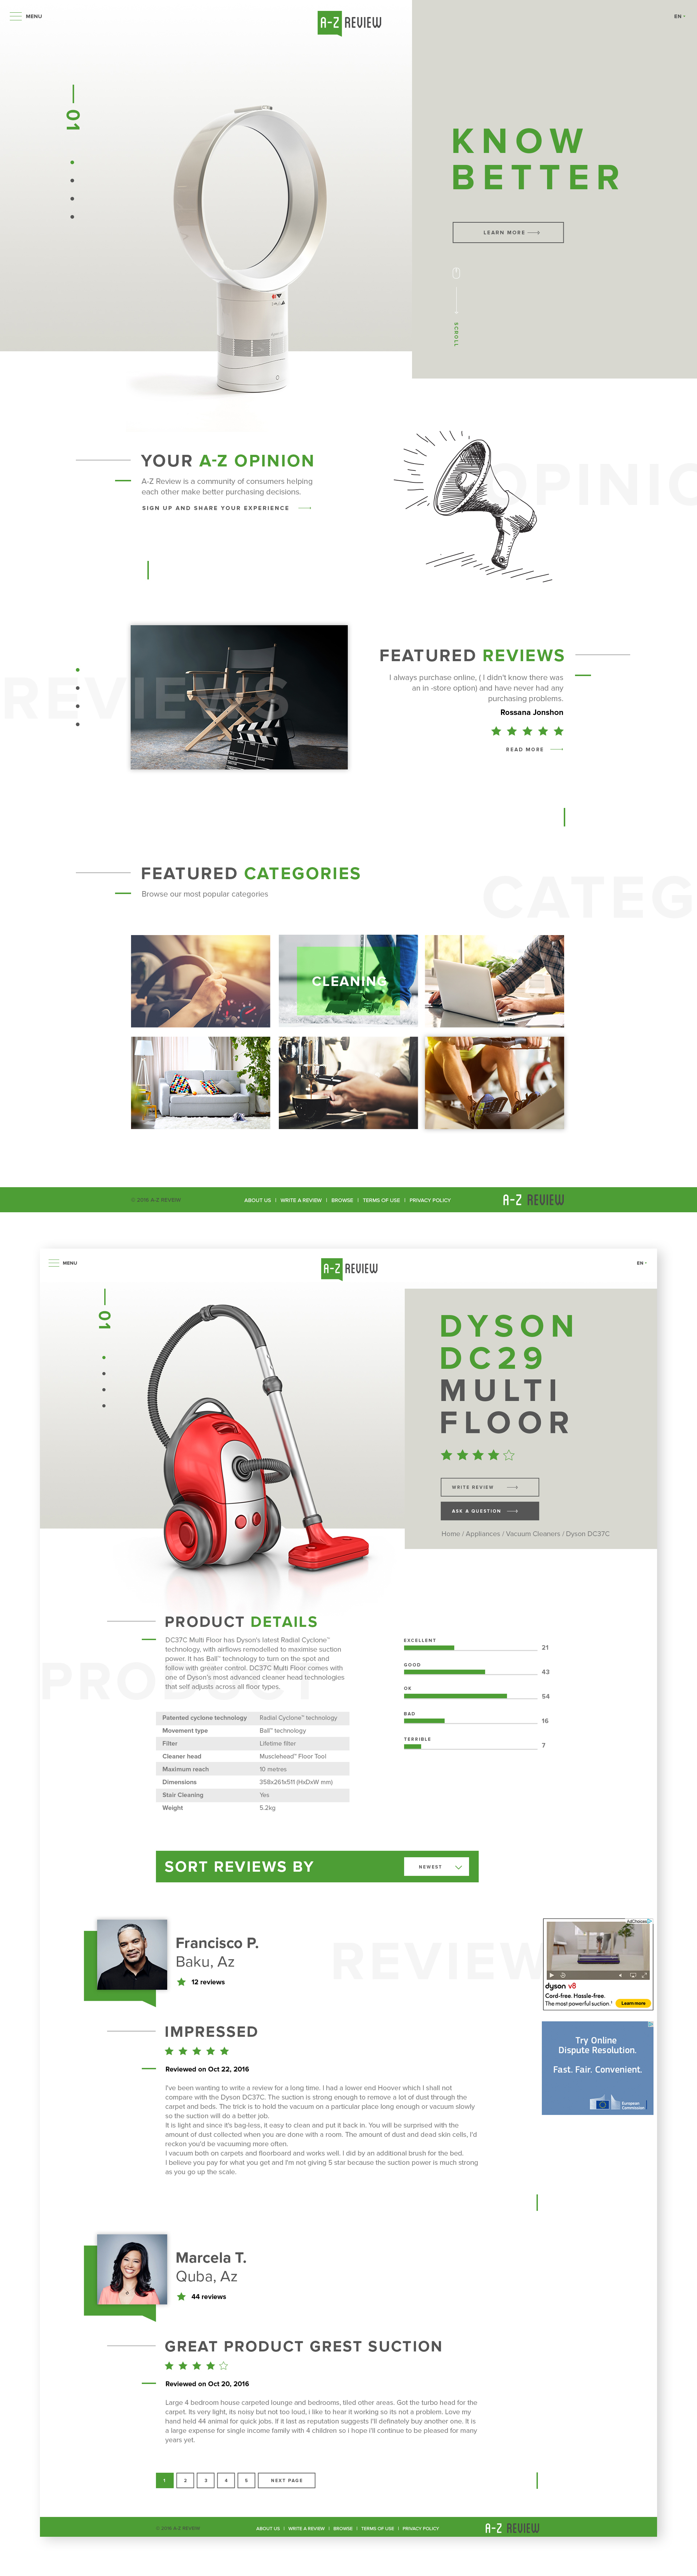 AZ Review website concept.